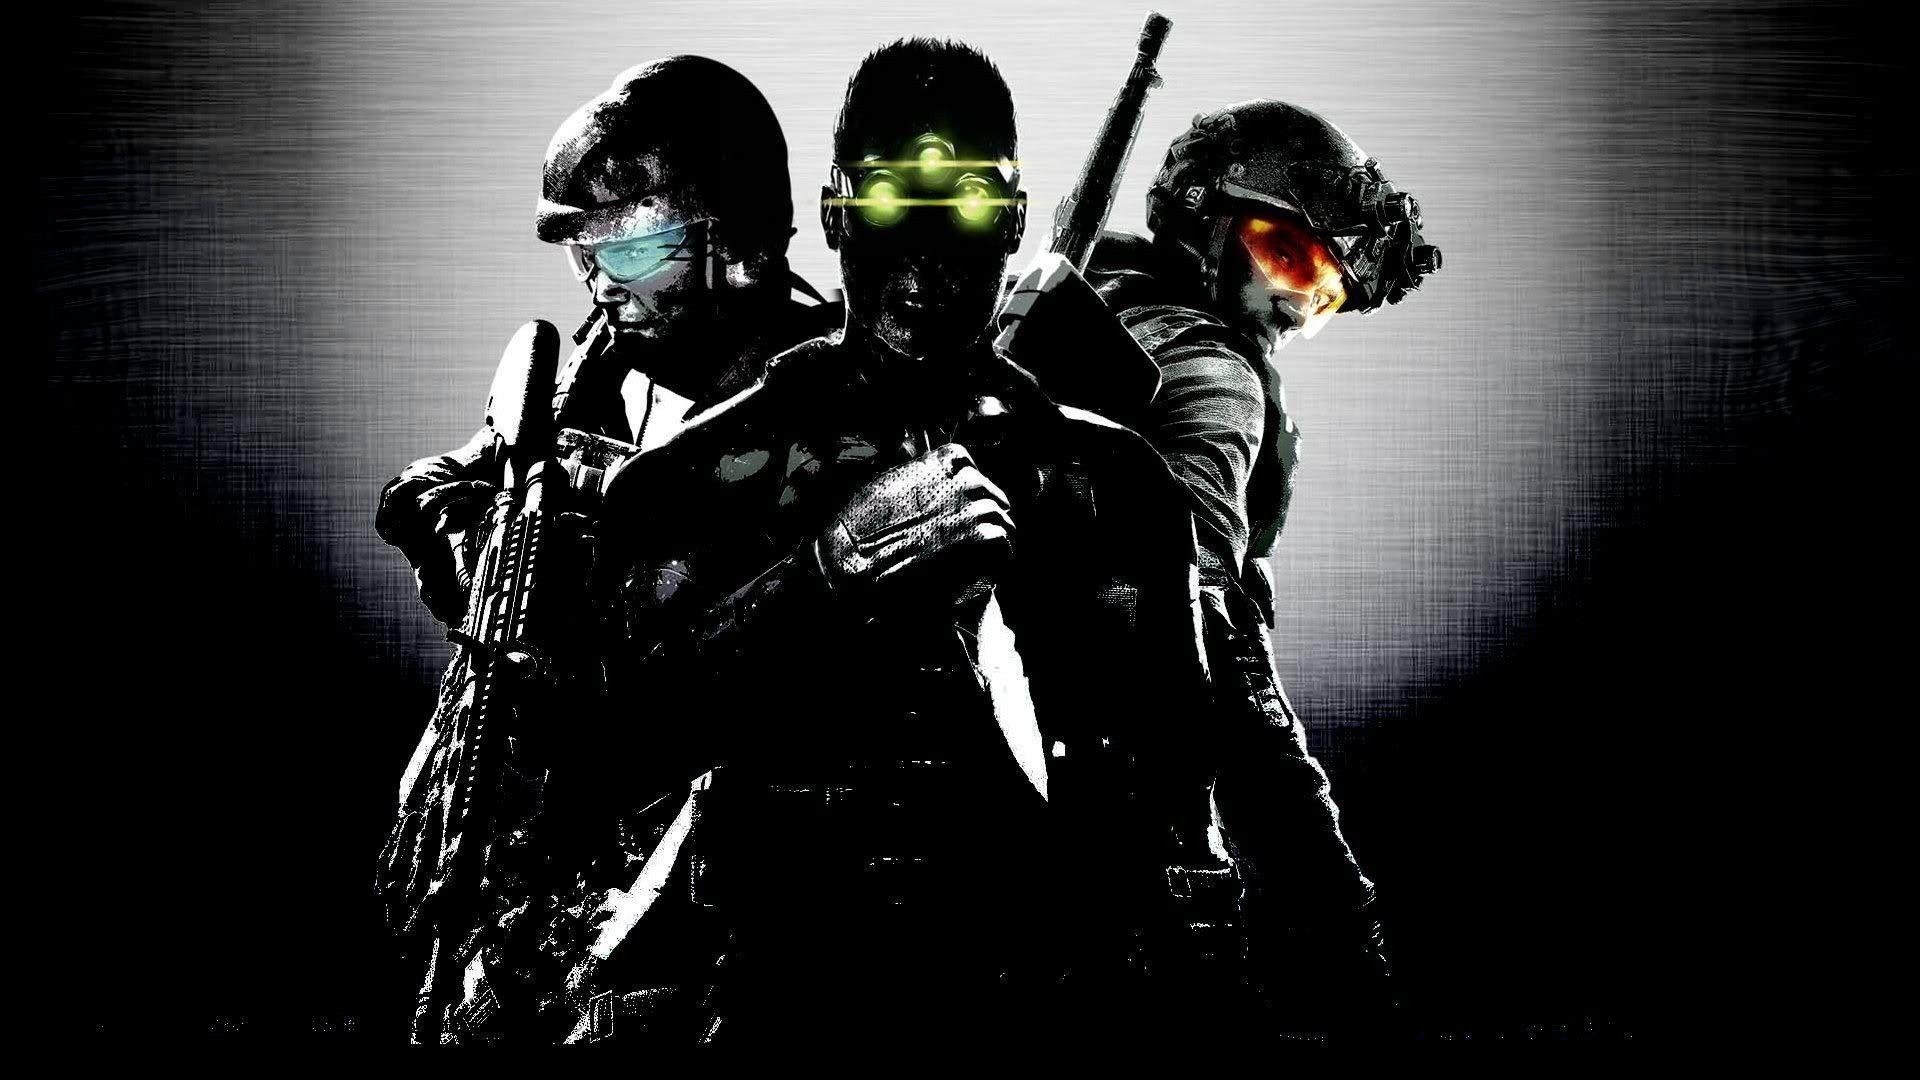 Tom Clancy S Splinter Cell Wallpapers Top Free Tom Clancy S